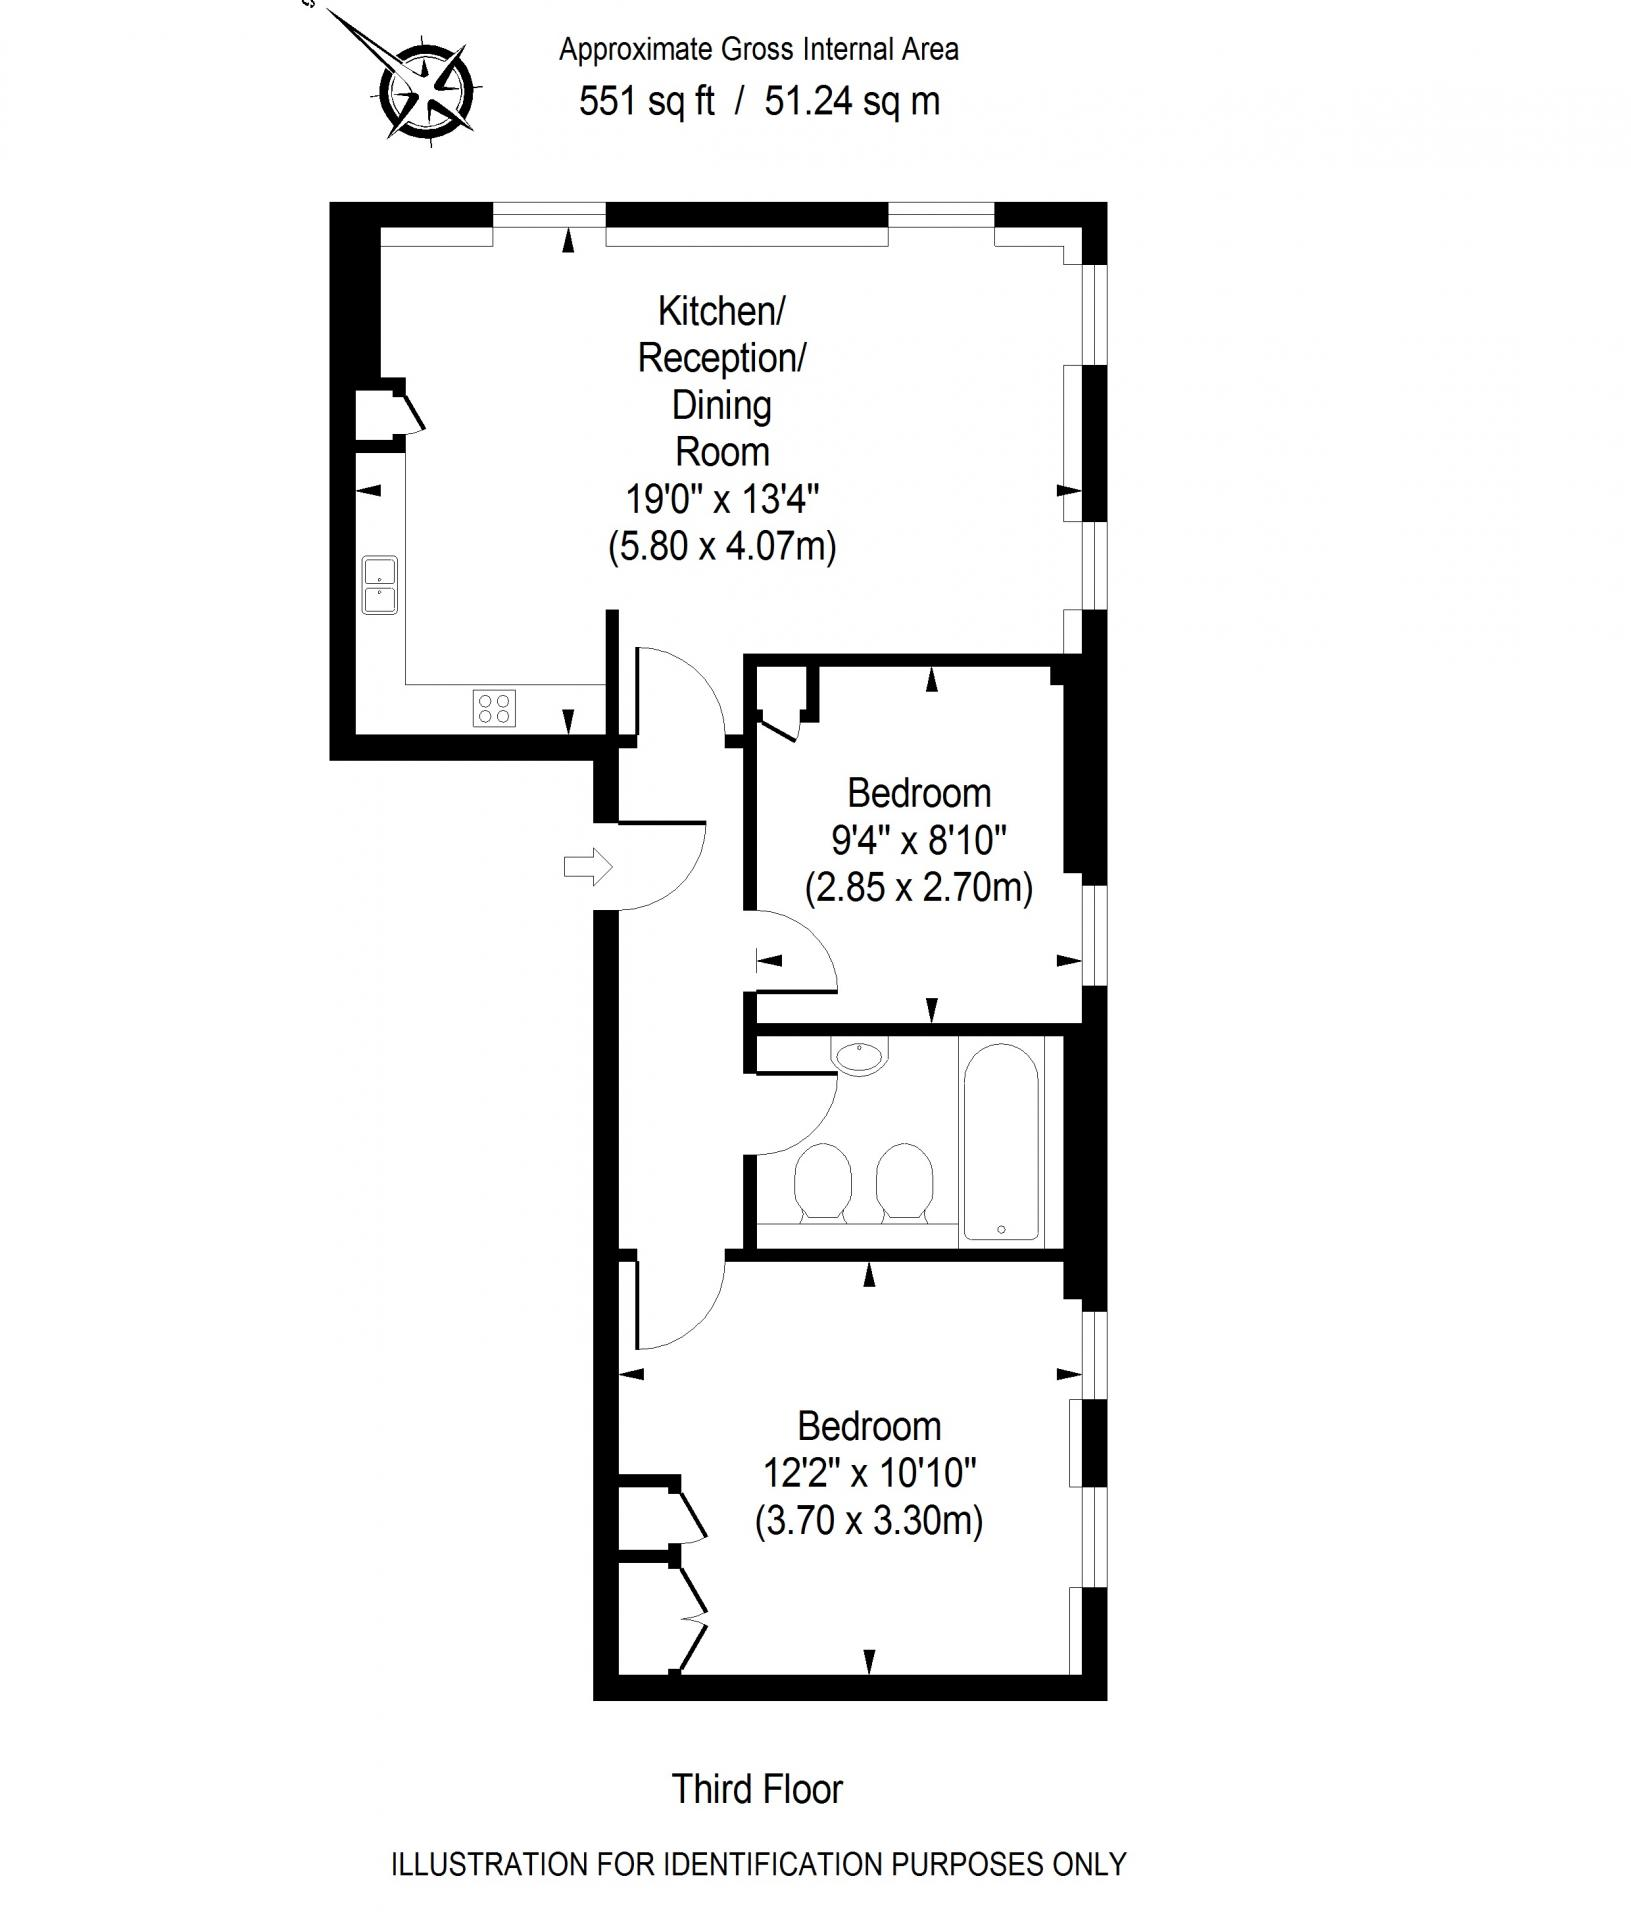 2 bed floor plan of Chilworth Court Serviced Apartments, Paddington, London